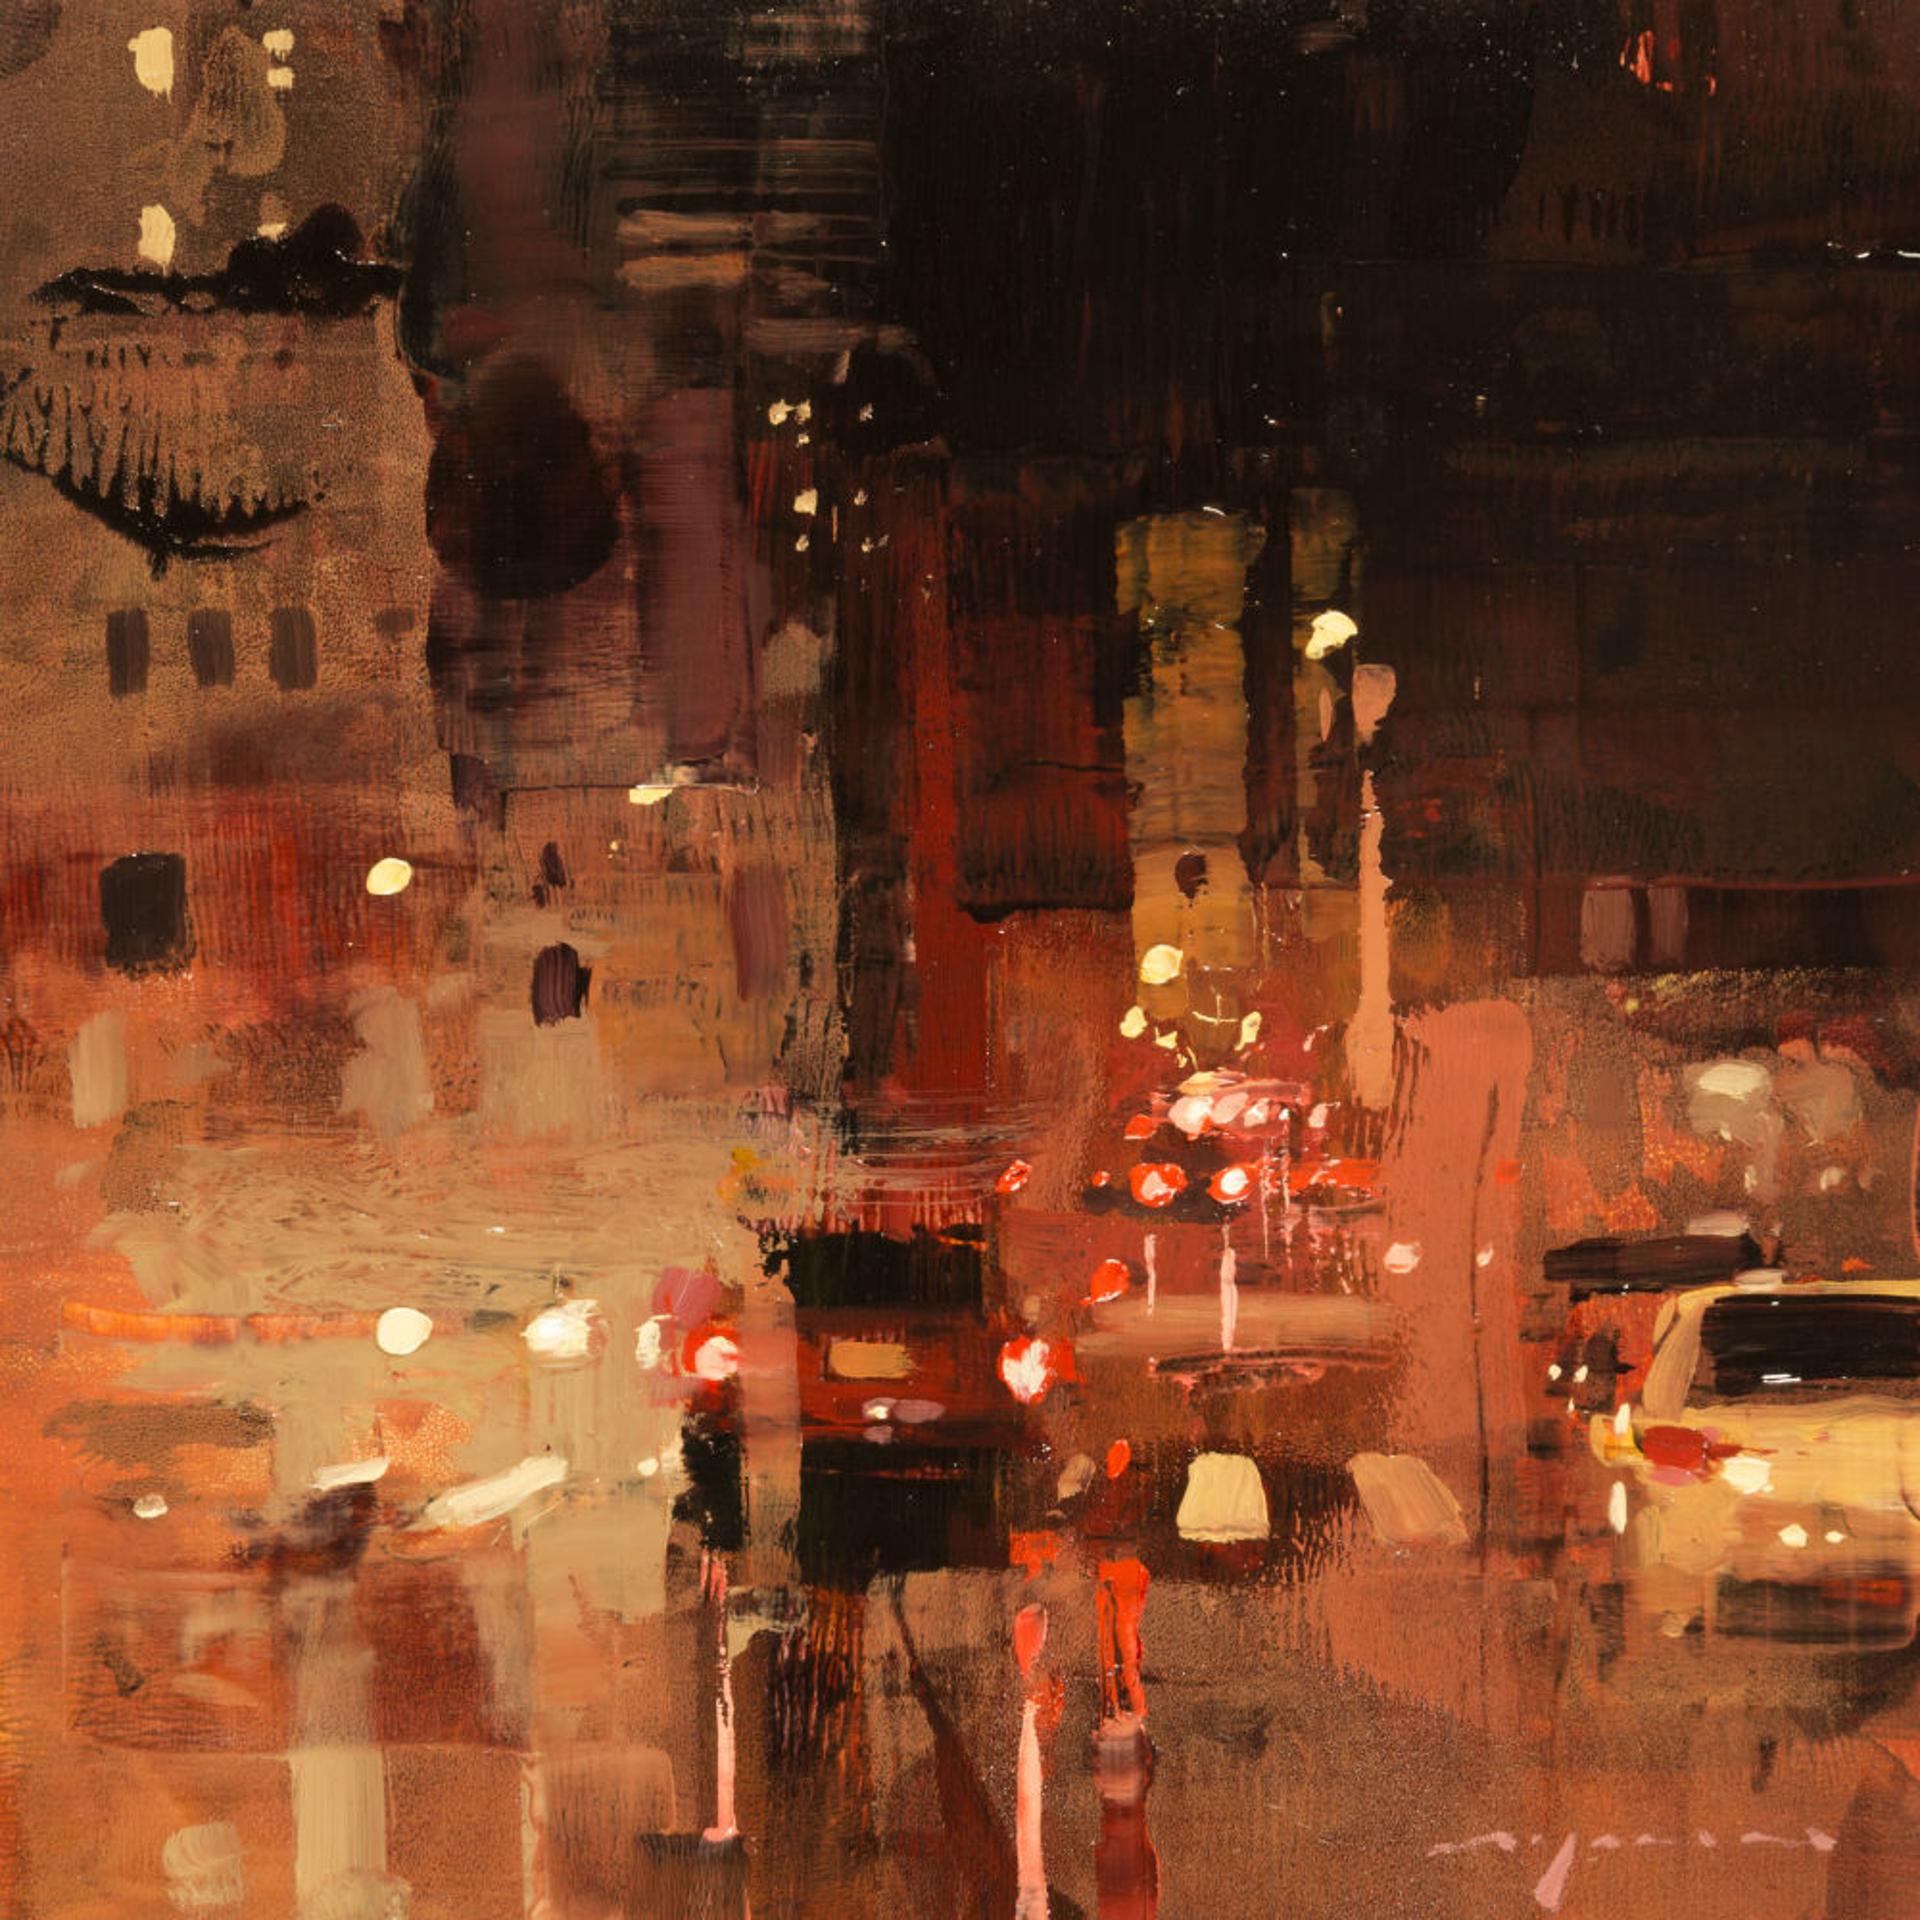 Cityscape  - Composed Form Study no. 19 by Jeremy Mann